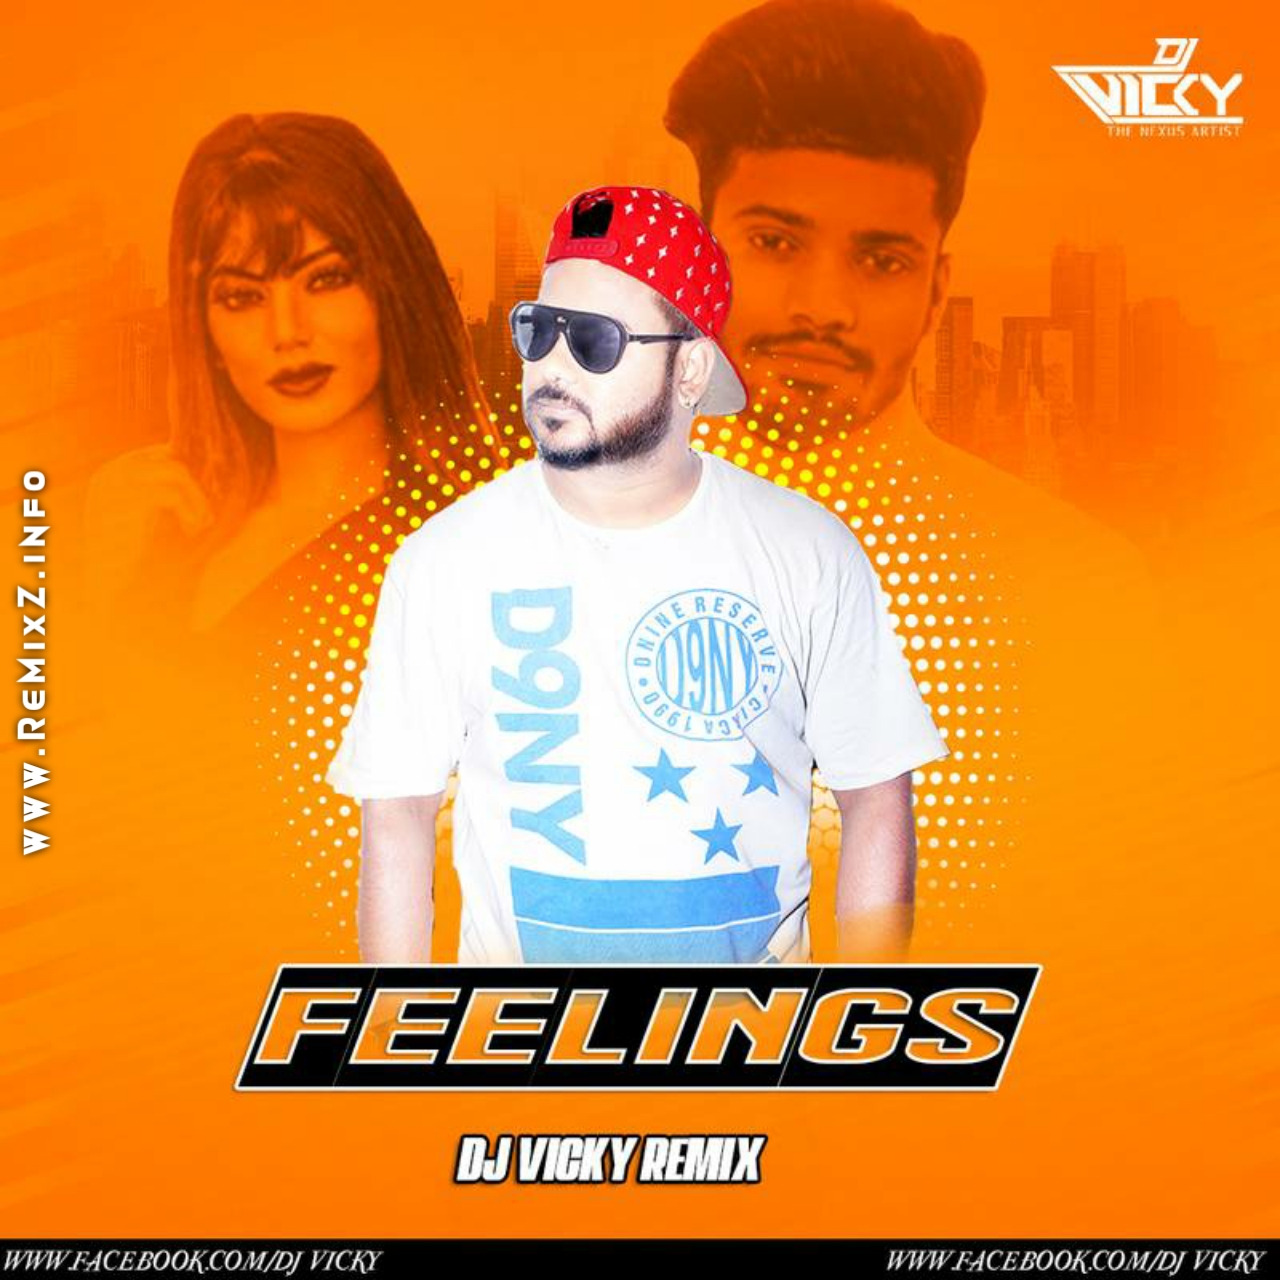 feeling-sumit-goswami-remix-dj-vicky.jpg